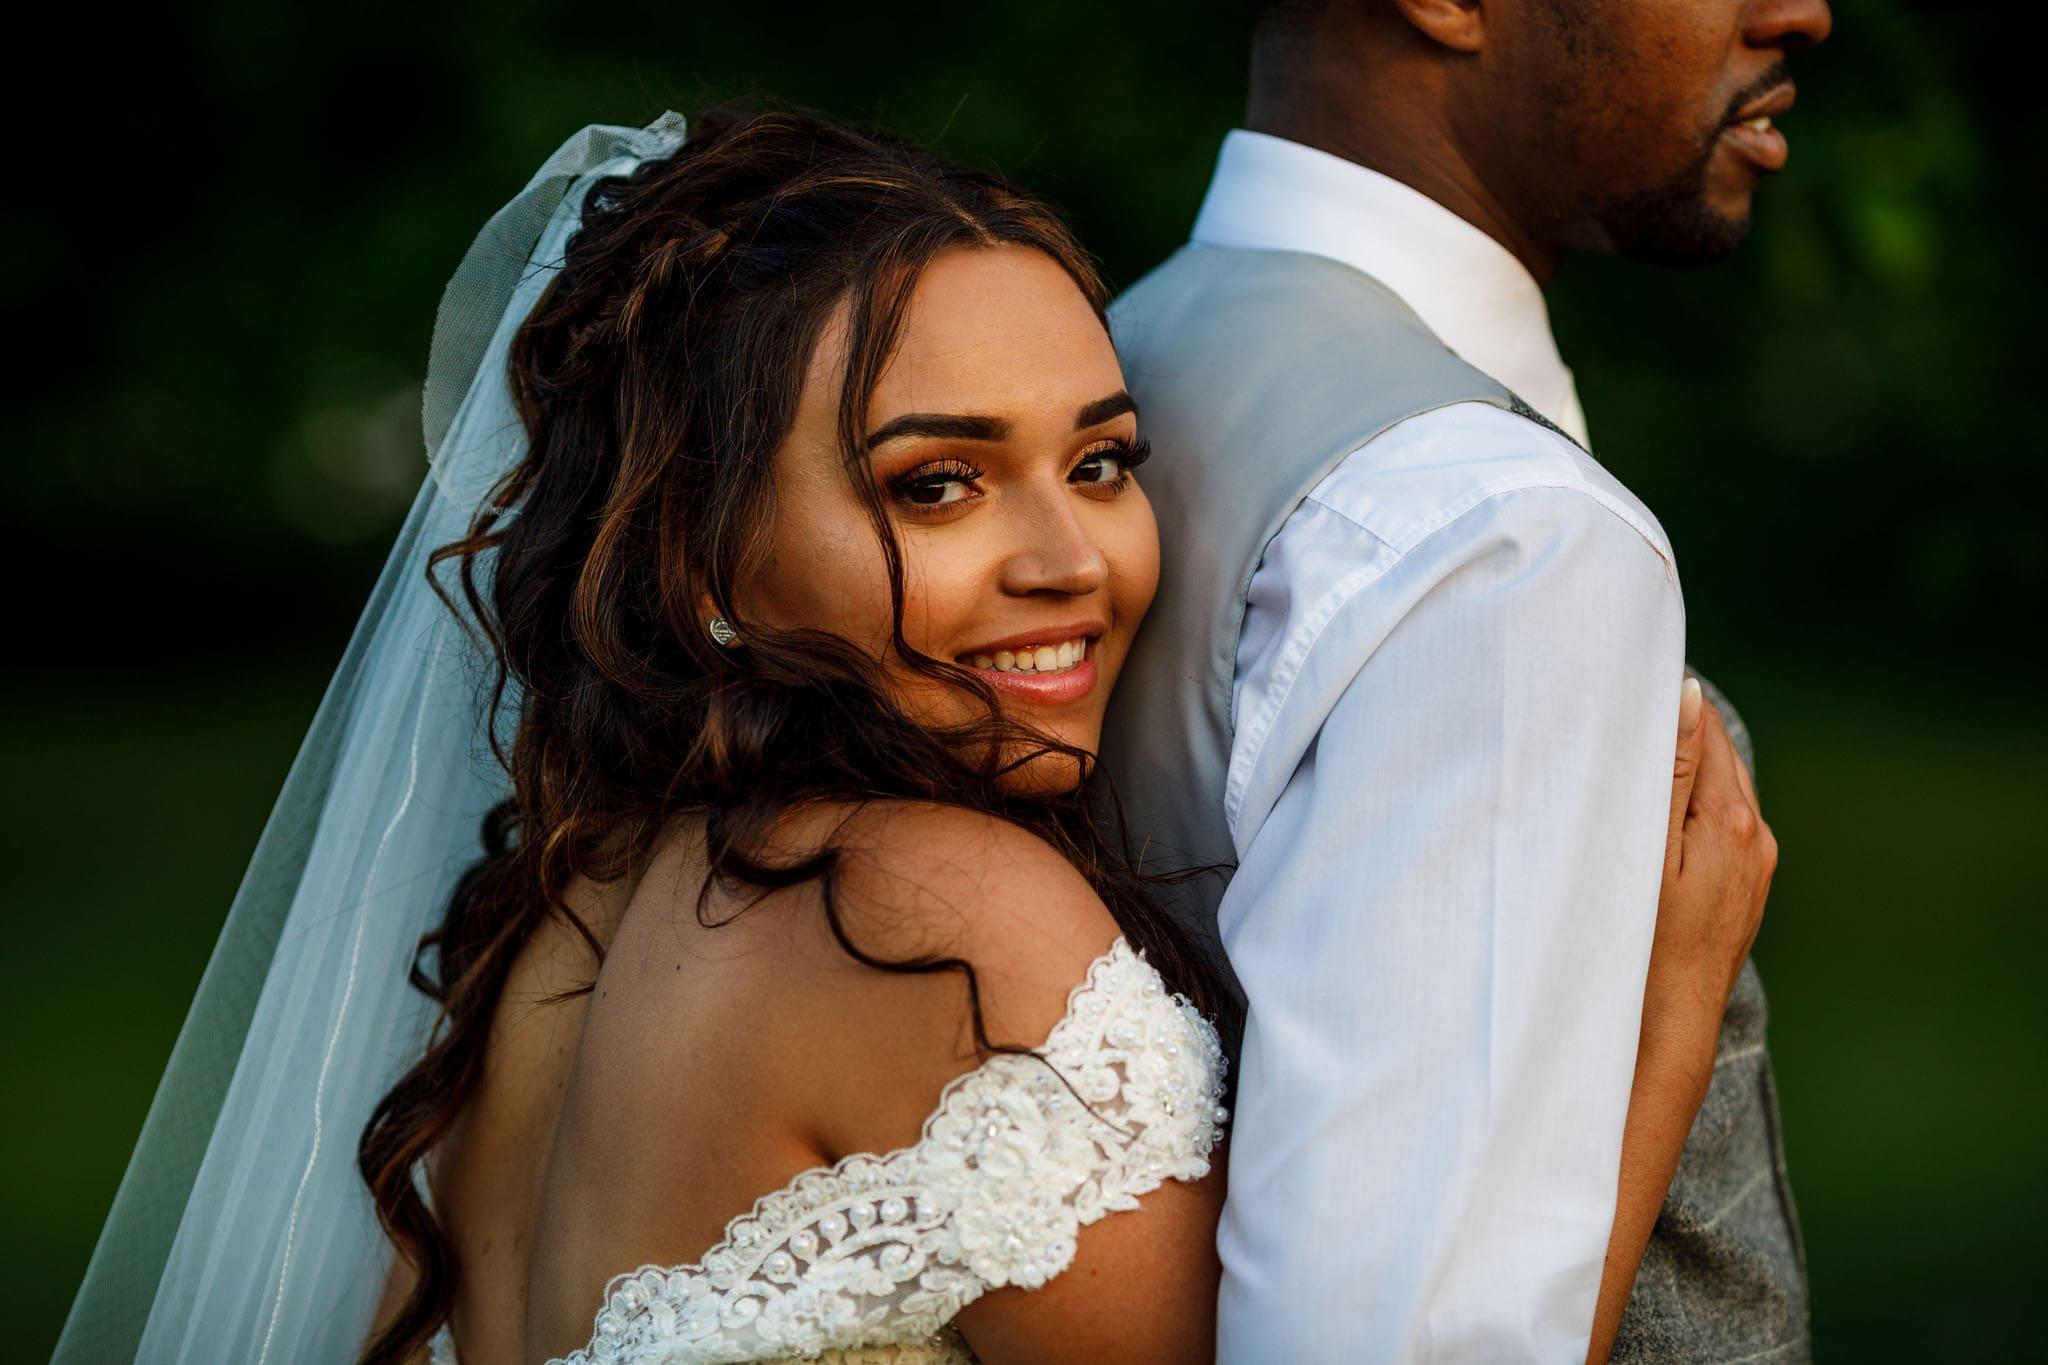 the bride hugging the groom